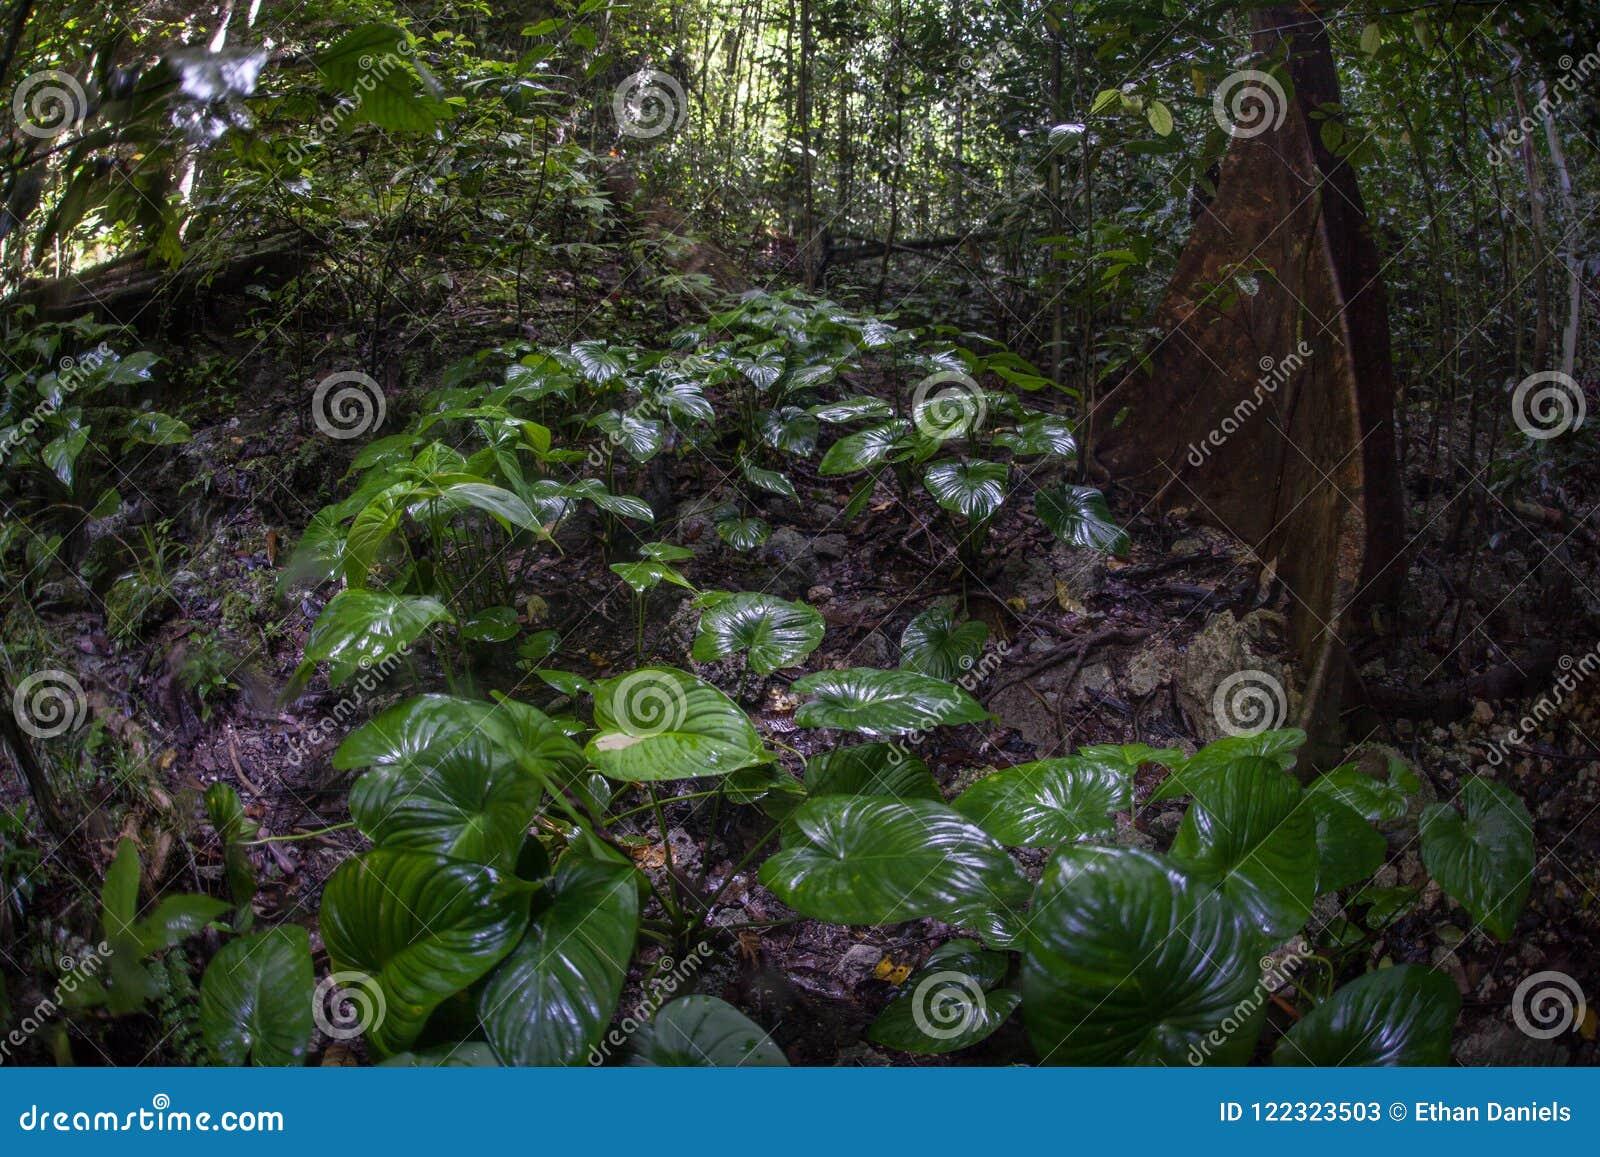 Healthy Rainforest in Raja Ampat, Indonesia